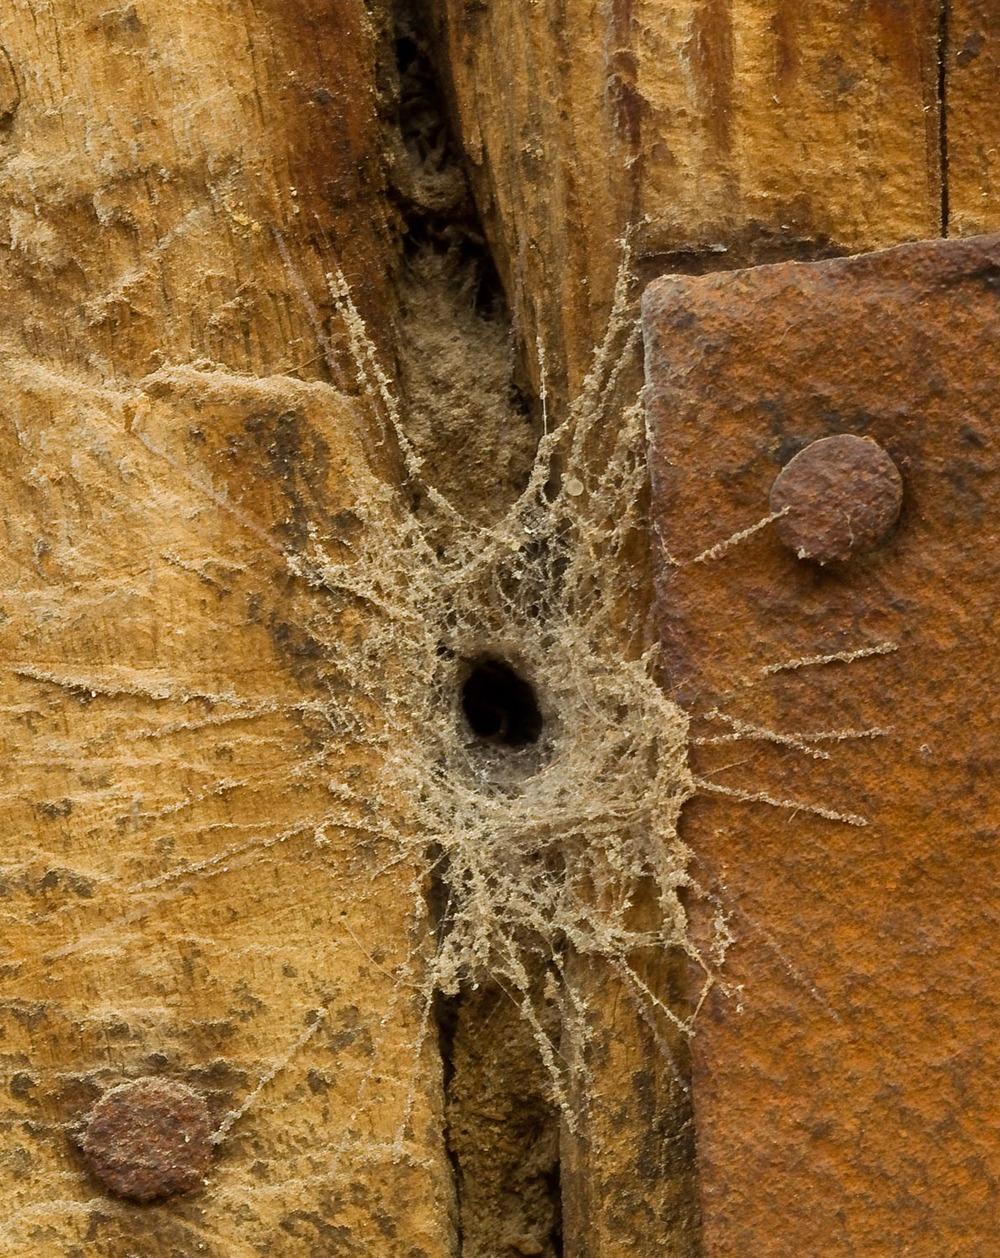 Spider web, Cairo